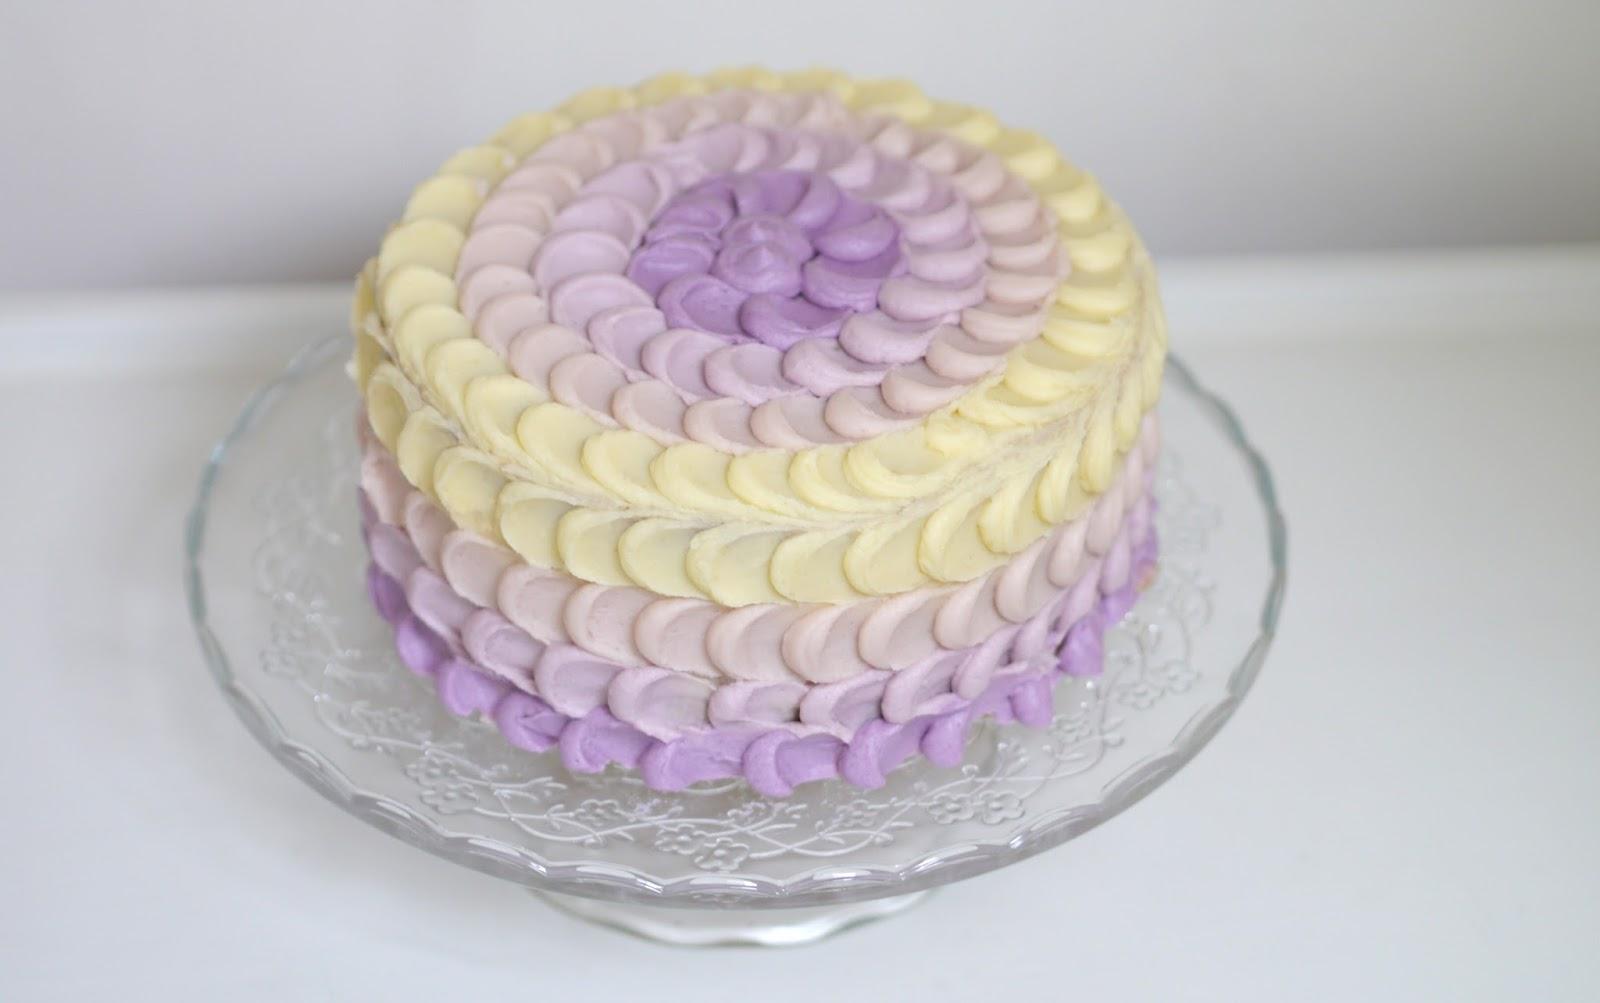 Handmade Pastel Purple Lilac Ombre Petal Cake Recipe Tutorial